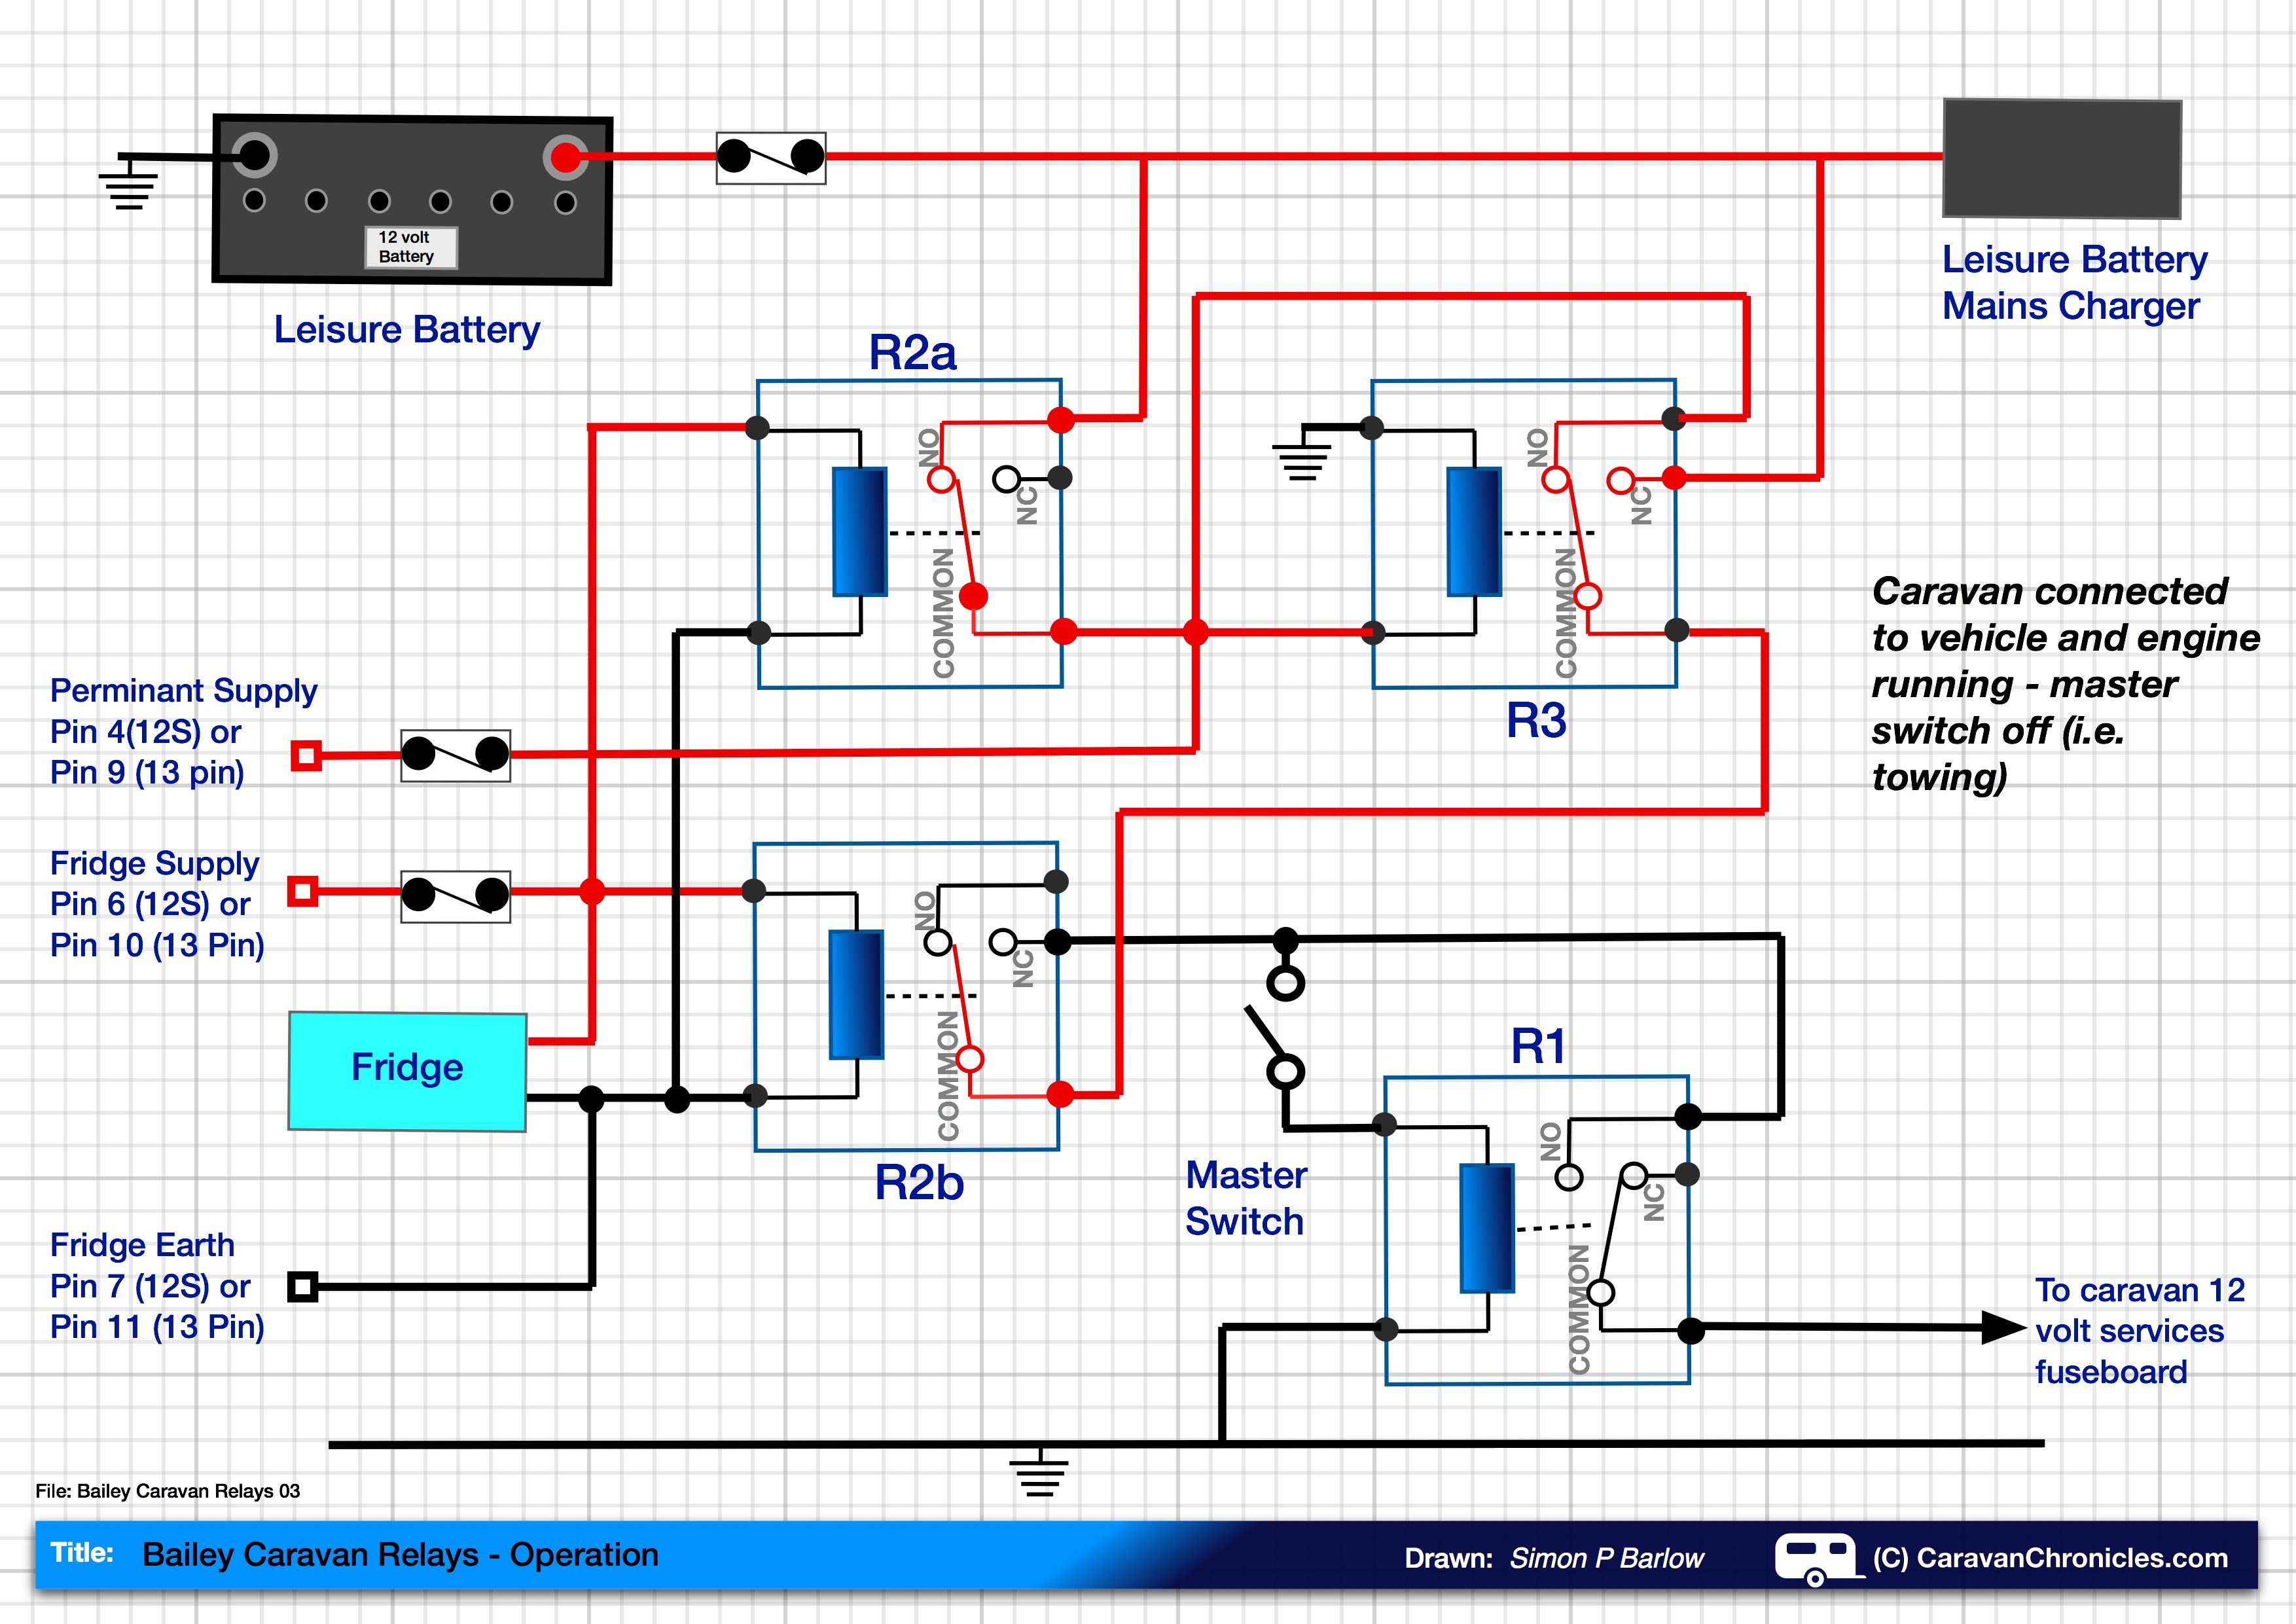 Repair Guides Wiring Diagrams Engine Schematic Caravanvoyager 5l Dodge Diagram For Ram1500 Full Size